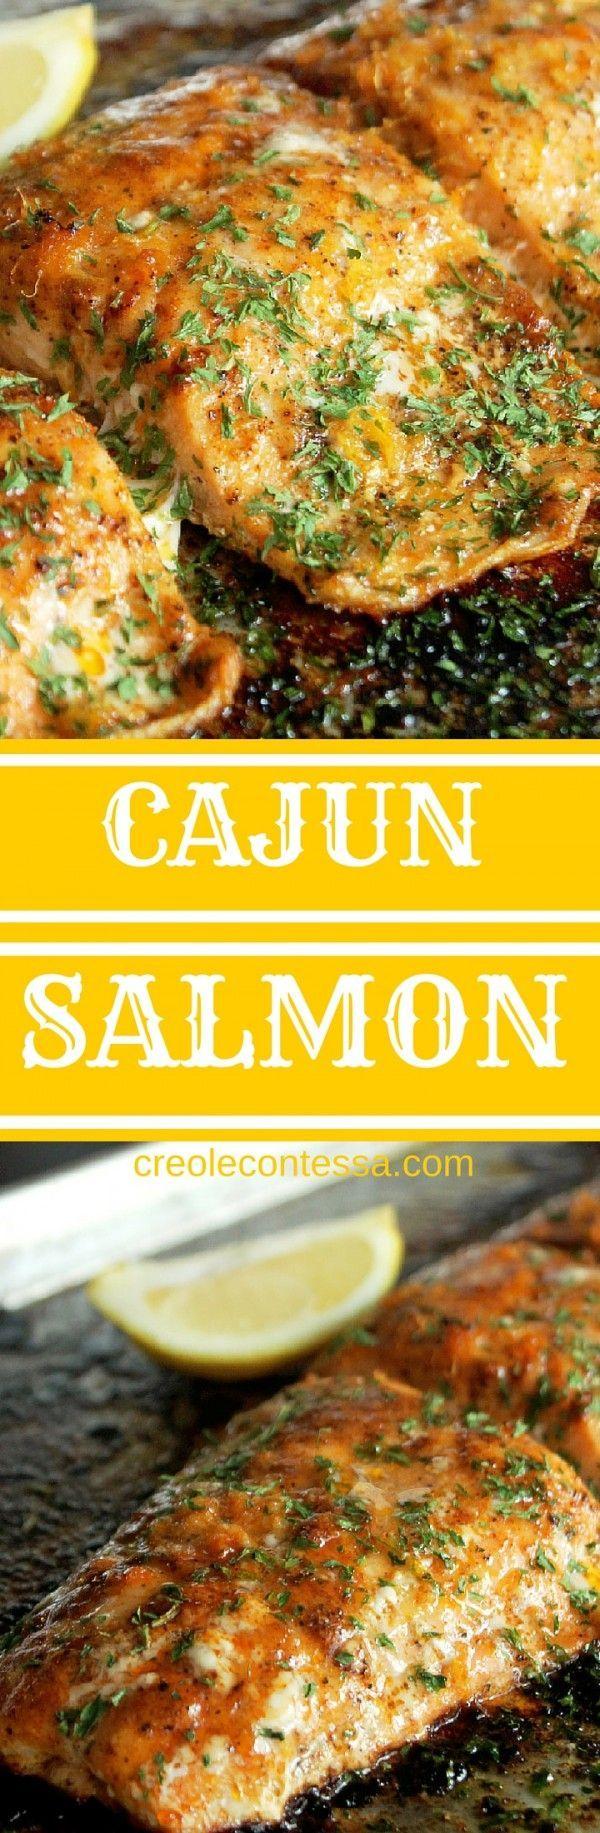 Get the recipe ♥ Cajun Salmon /recipes_to_go/